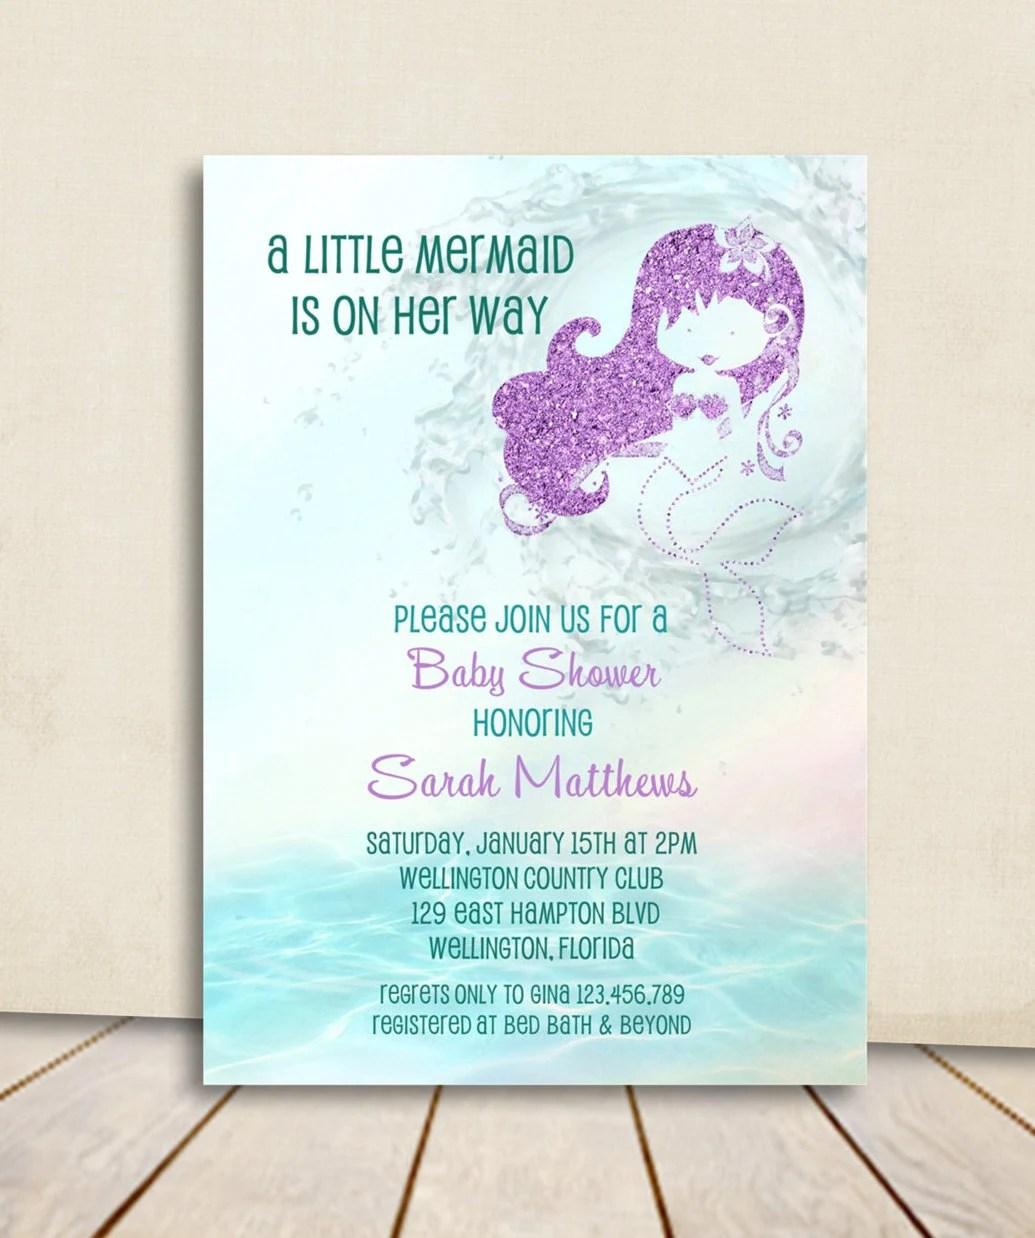 Mermaid Baby Shower Invitation - Turquoise and Purple Glitter Little